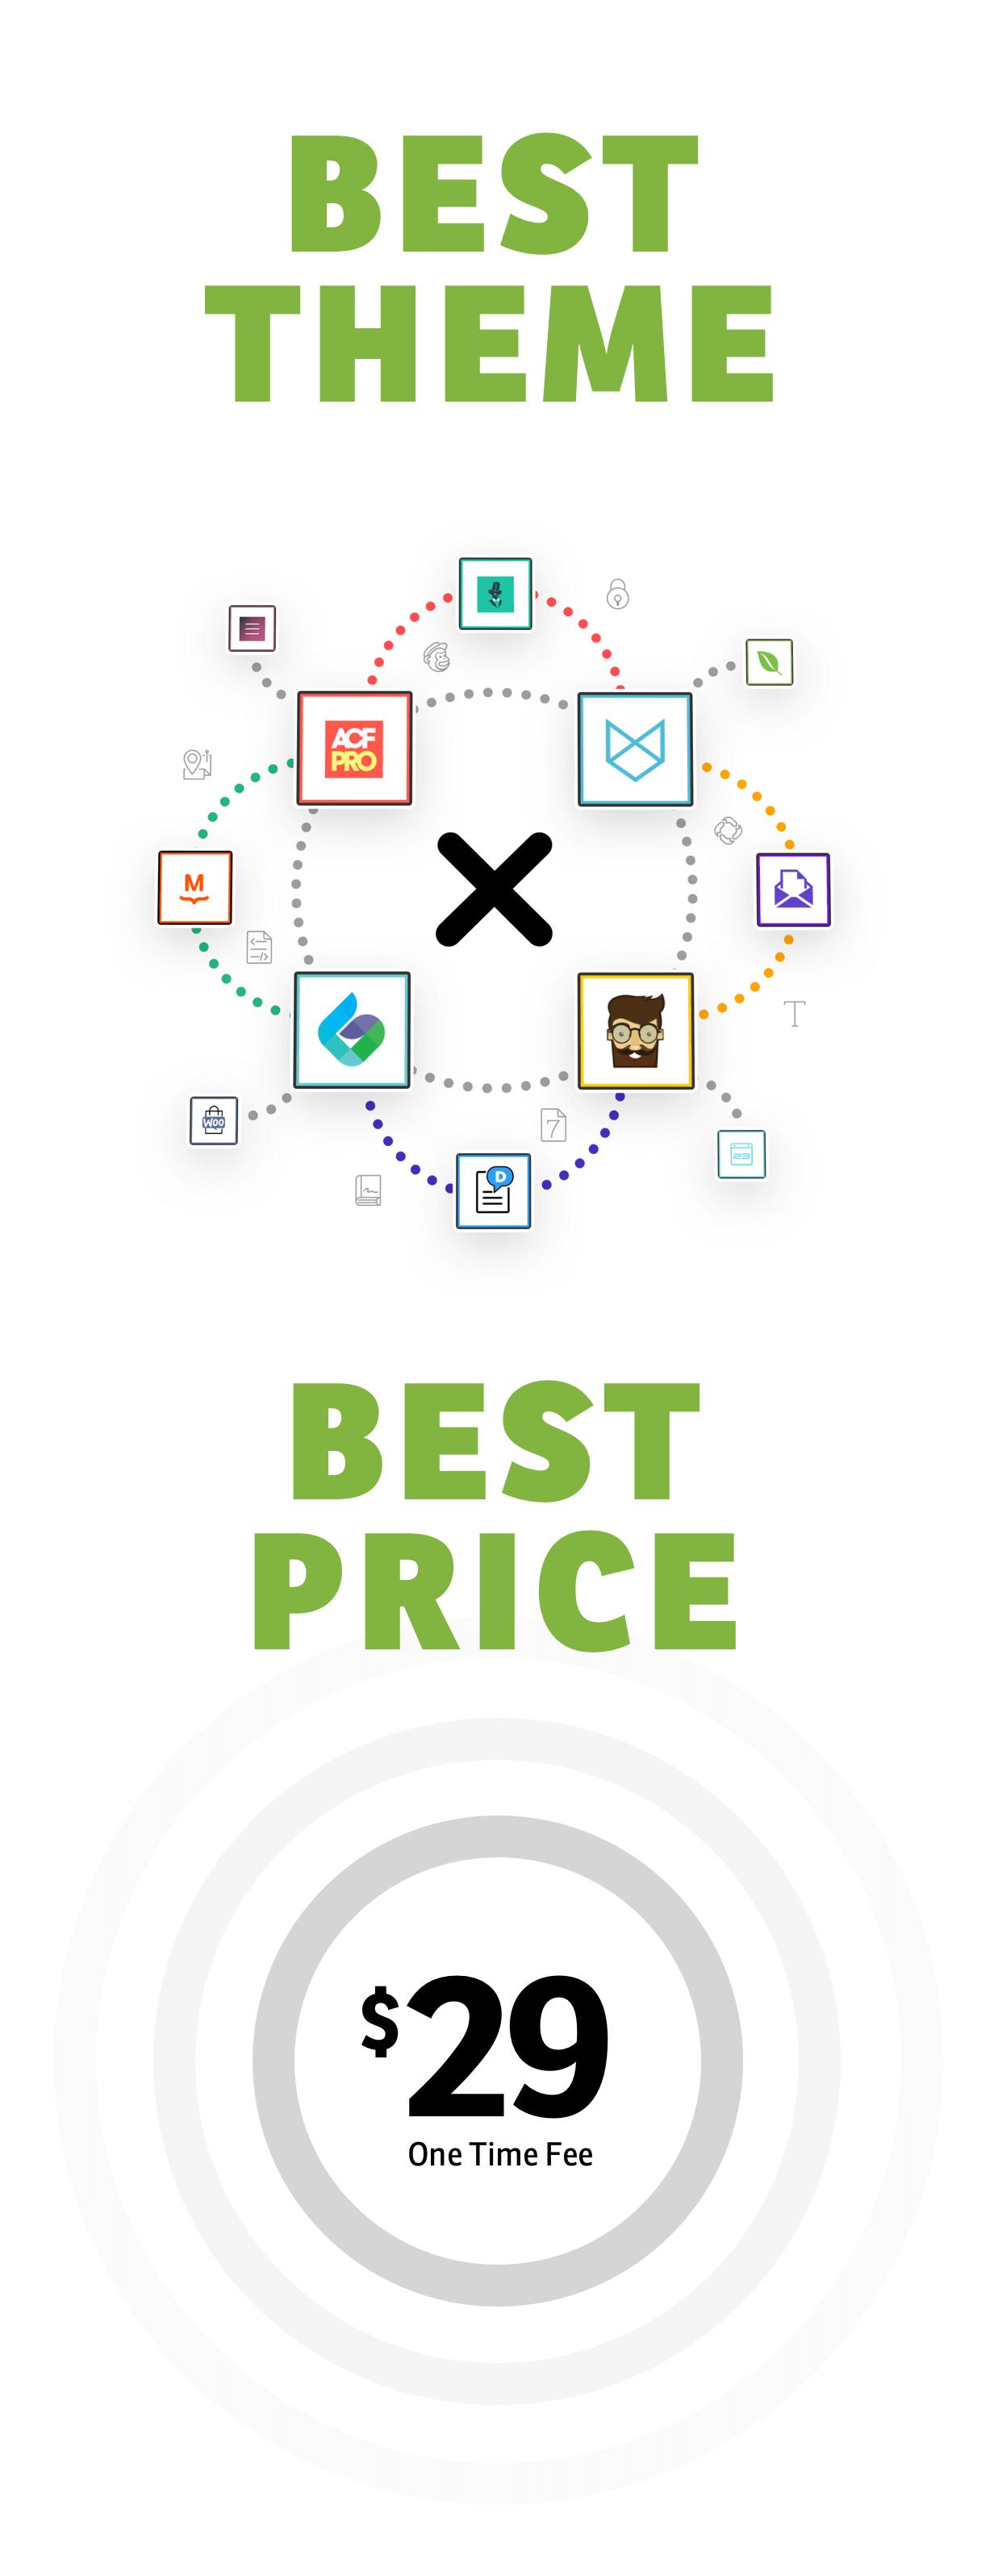 bestthemebestprice - X | The Theme